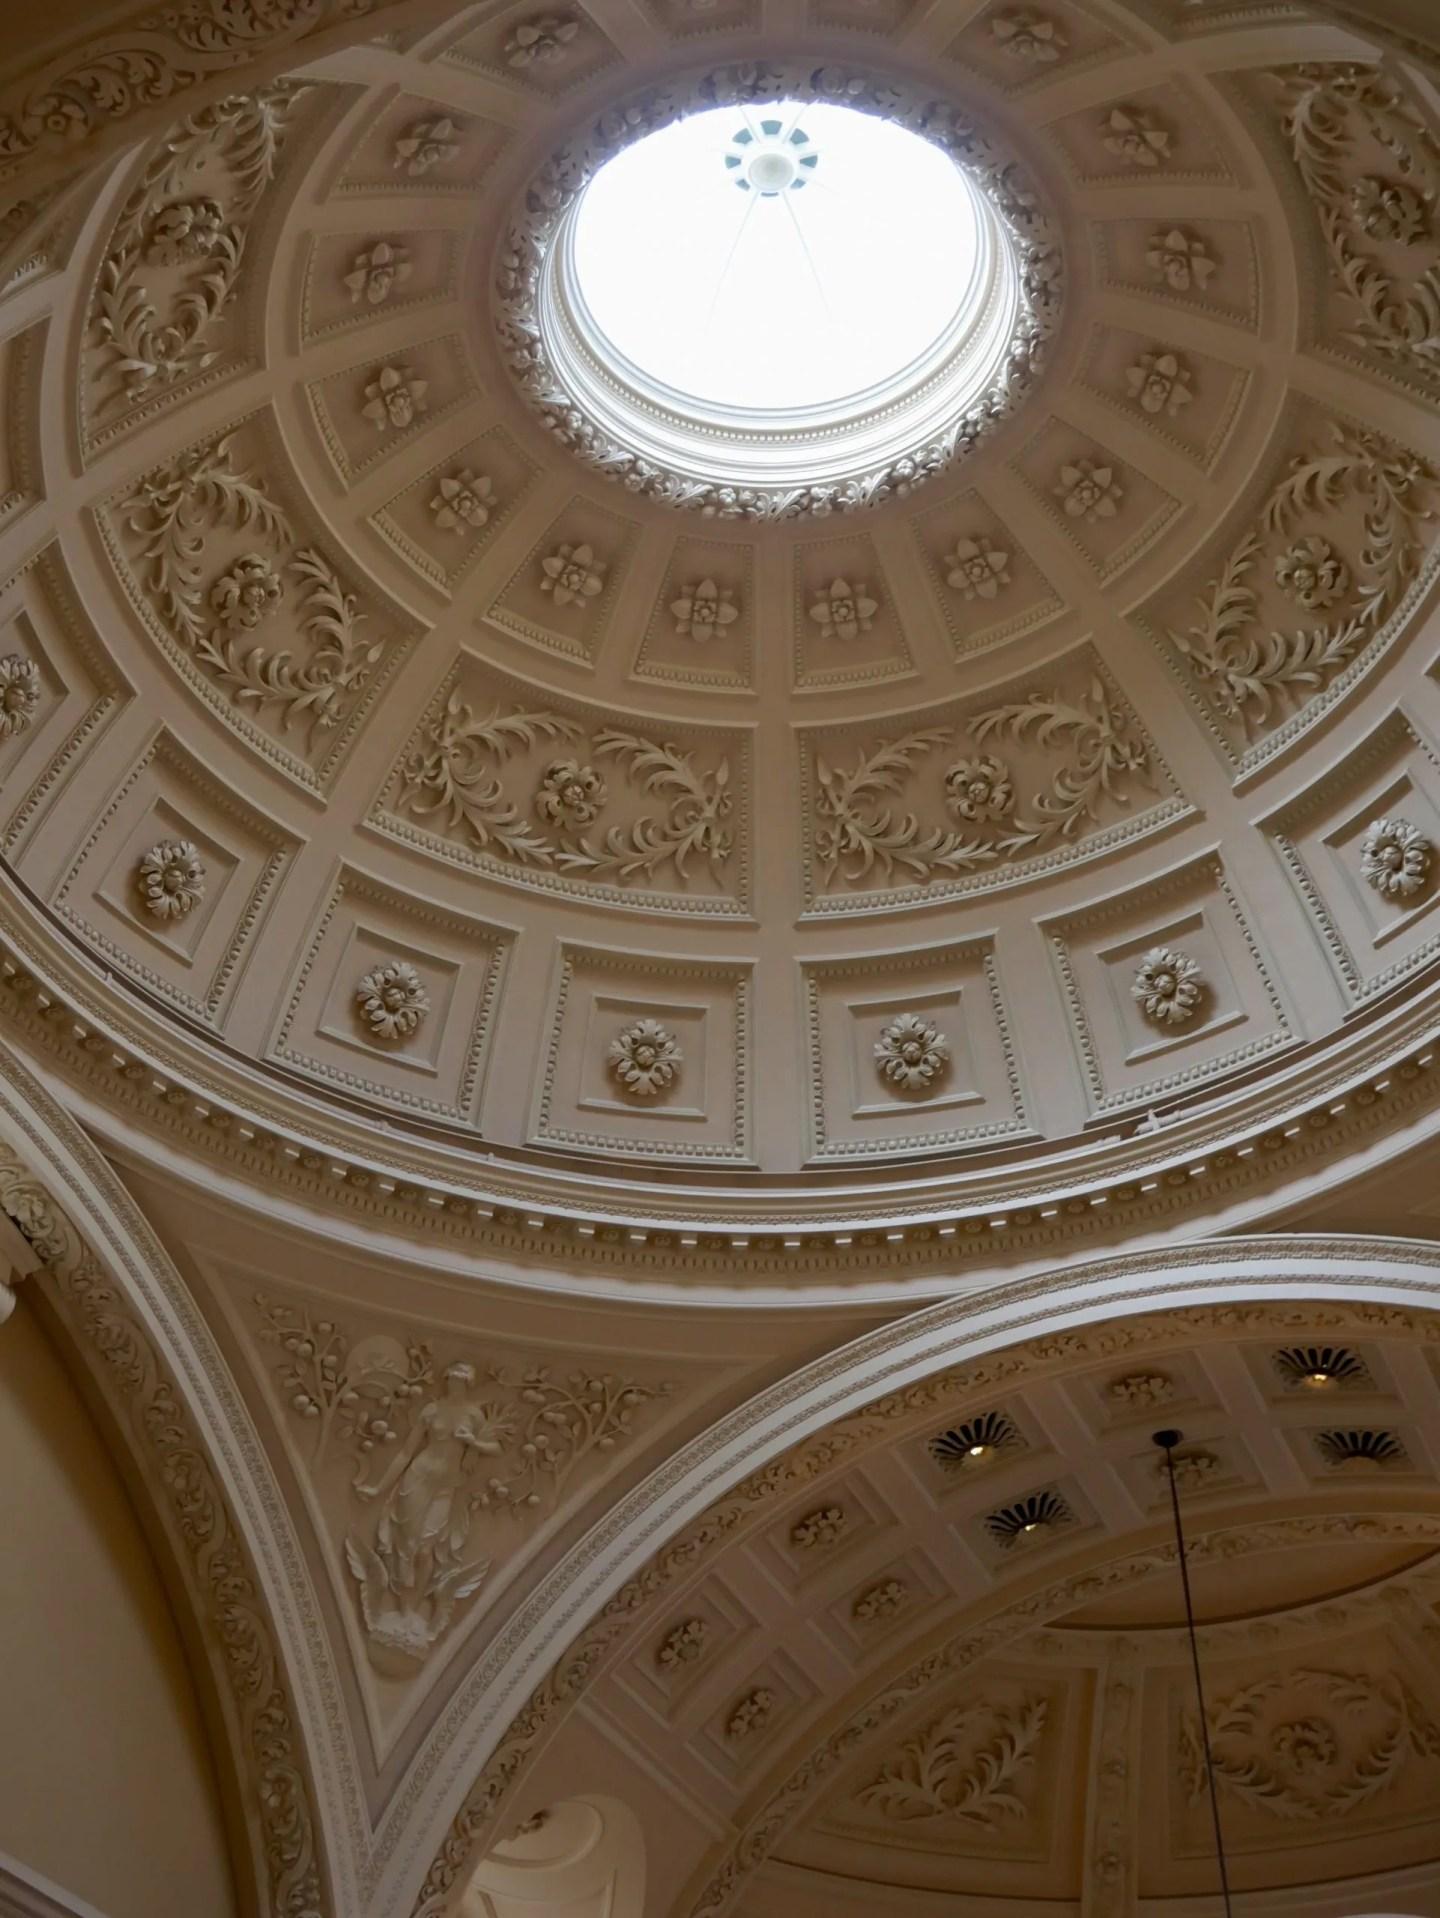 Bath Roman baths entrance ceiliing